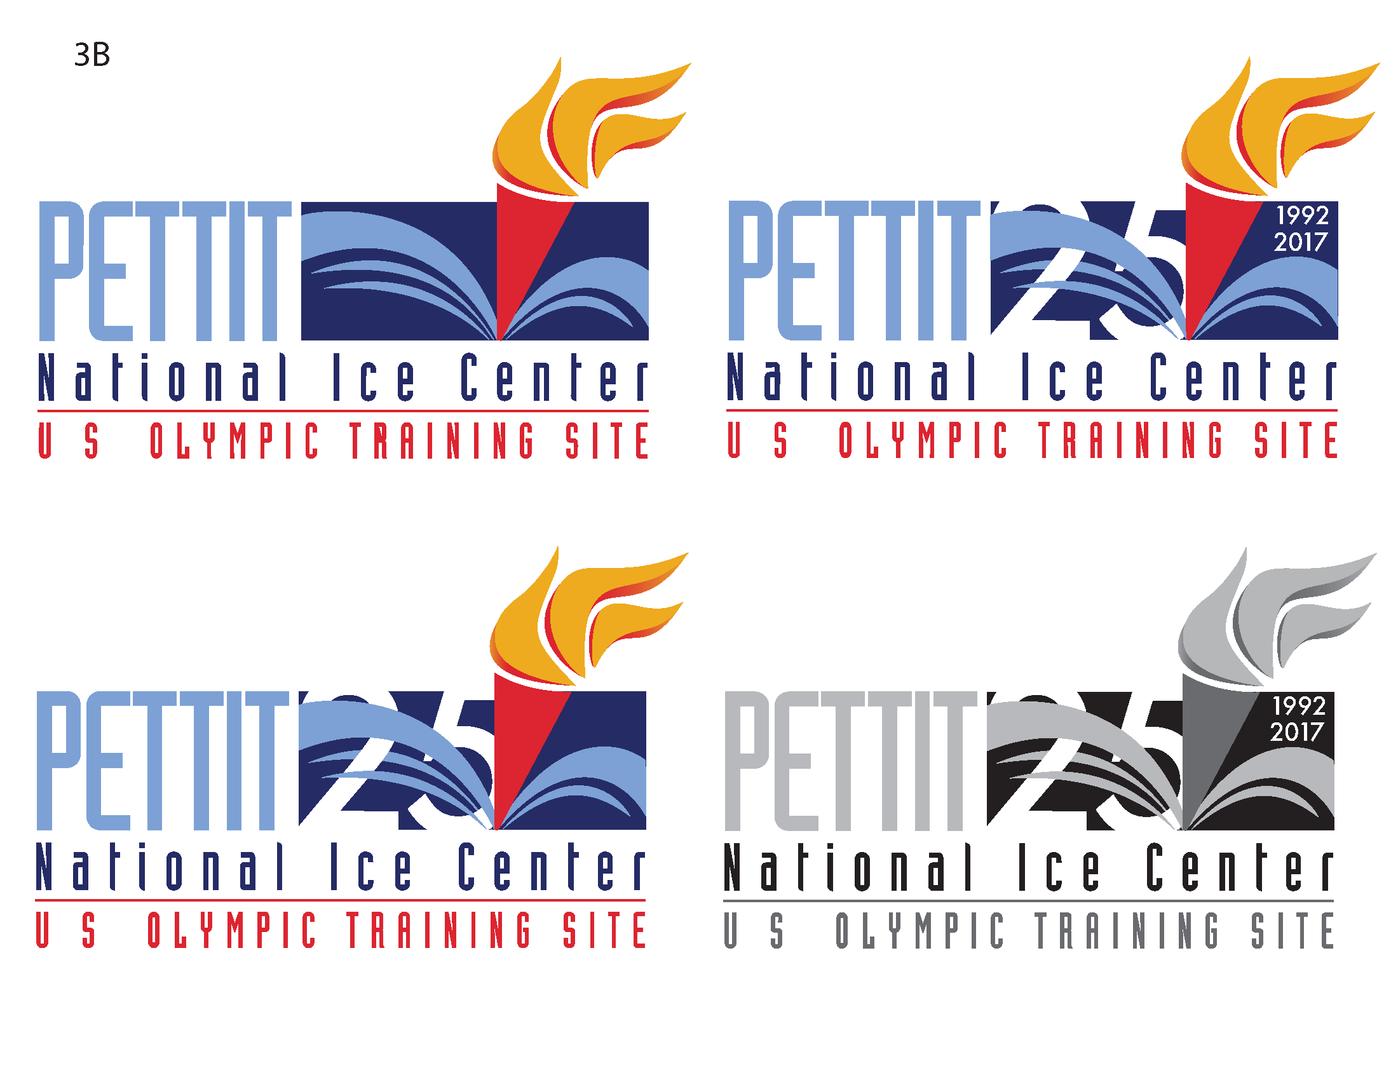 Pettit Center 25th Anniversary Pitch